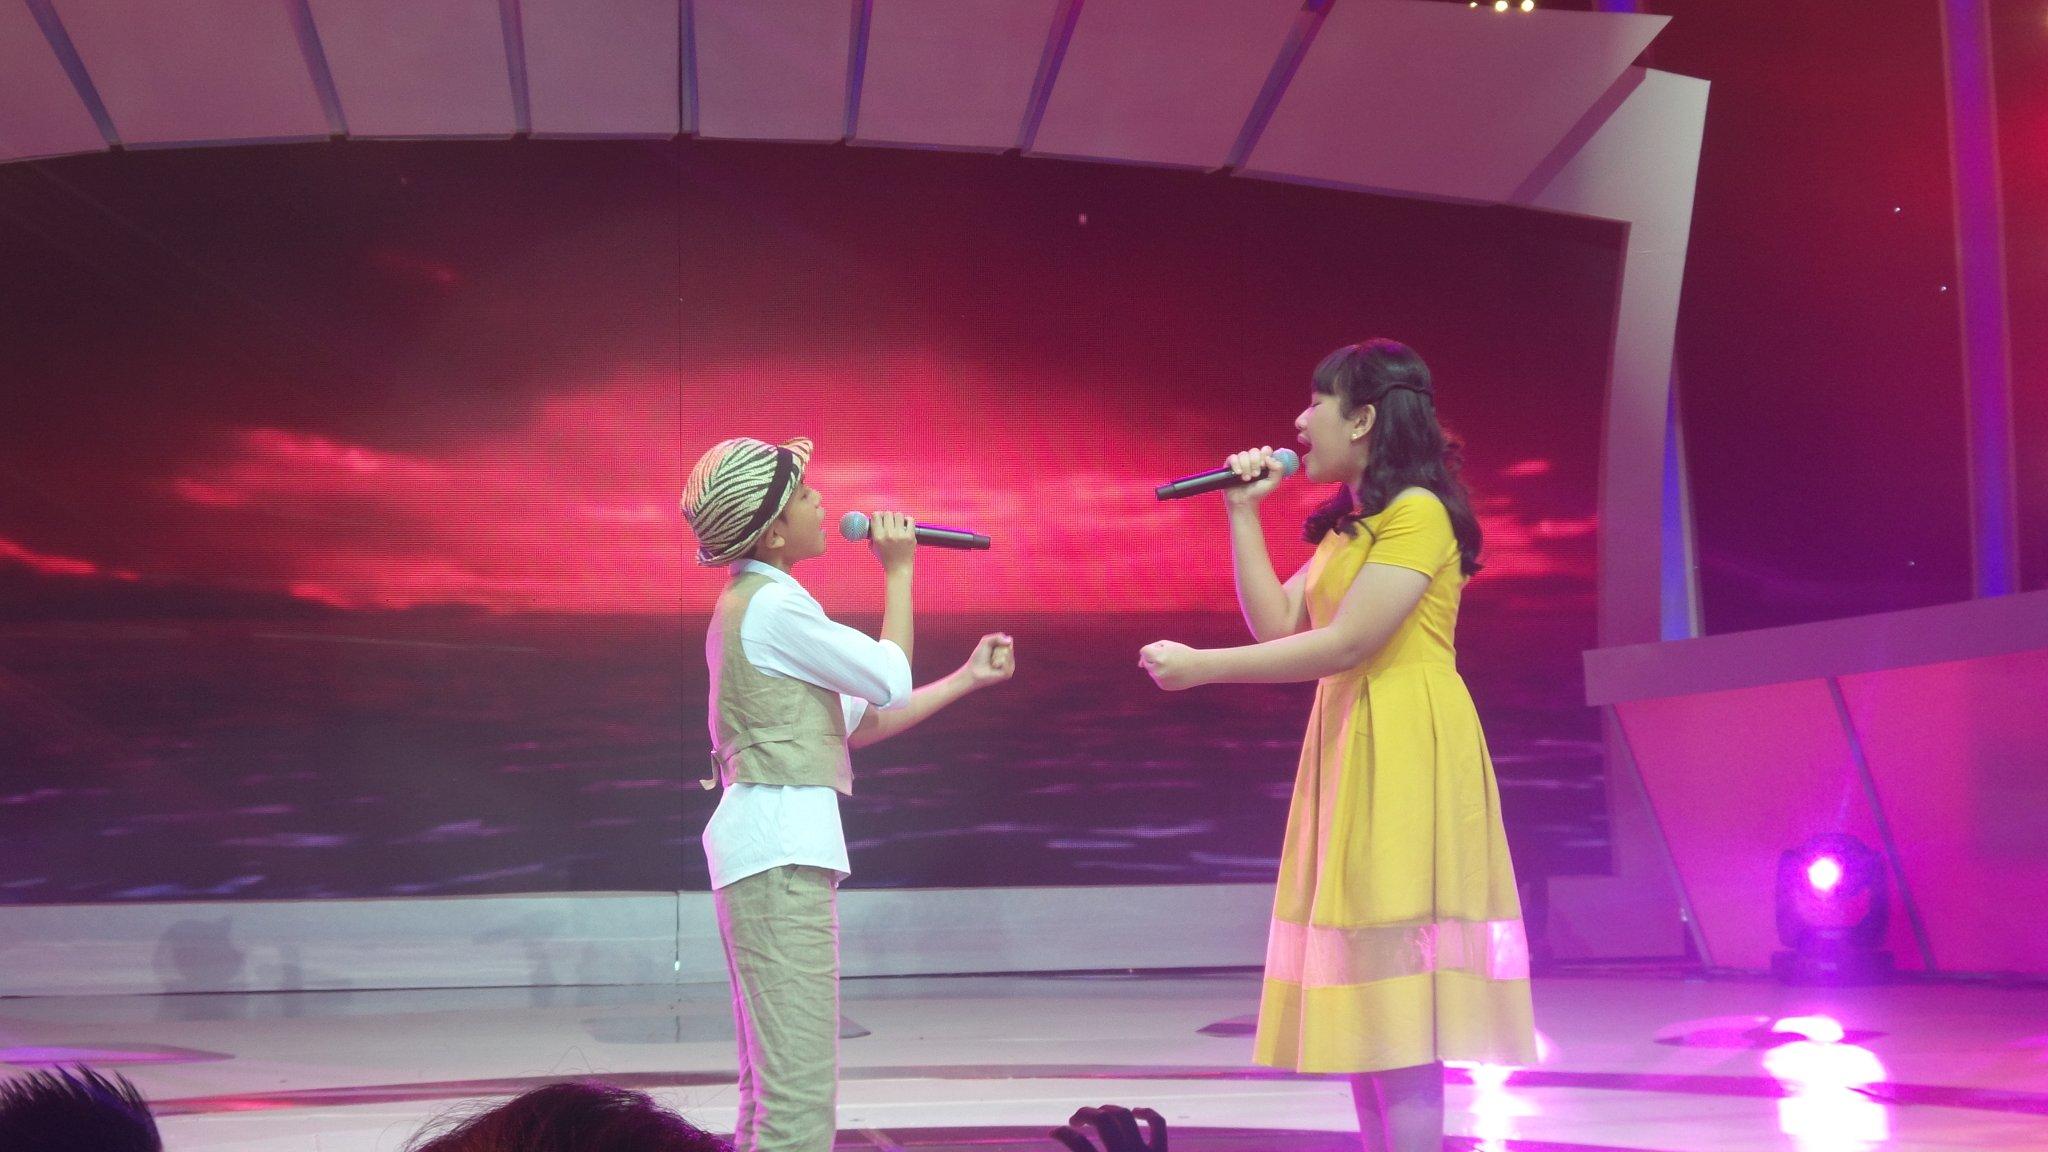 Duet yg ini jg gak kalah bagusnya @AuraIdolJr @NavisIdolJr dgn lagu my heart #IdolJrDuetStar @Official_MNCTV https://t.co/no53LsTwZ2